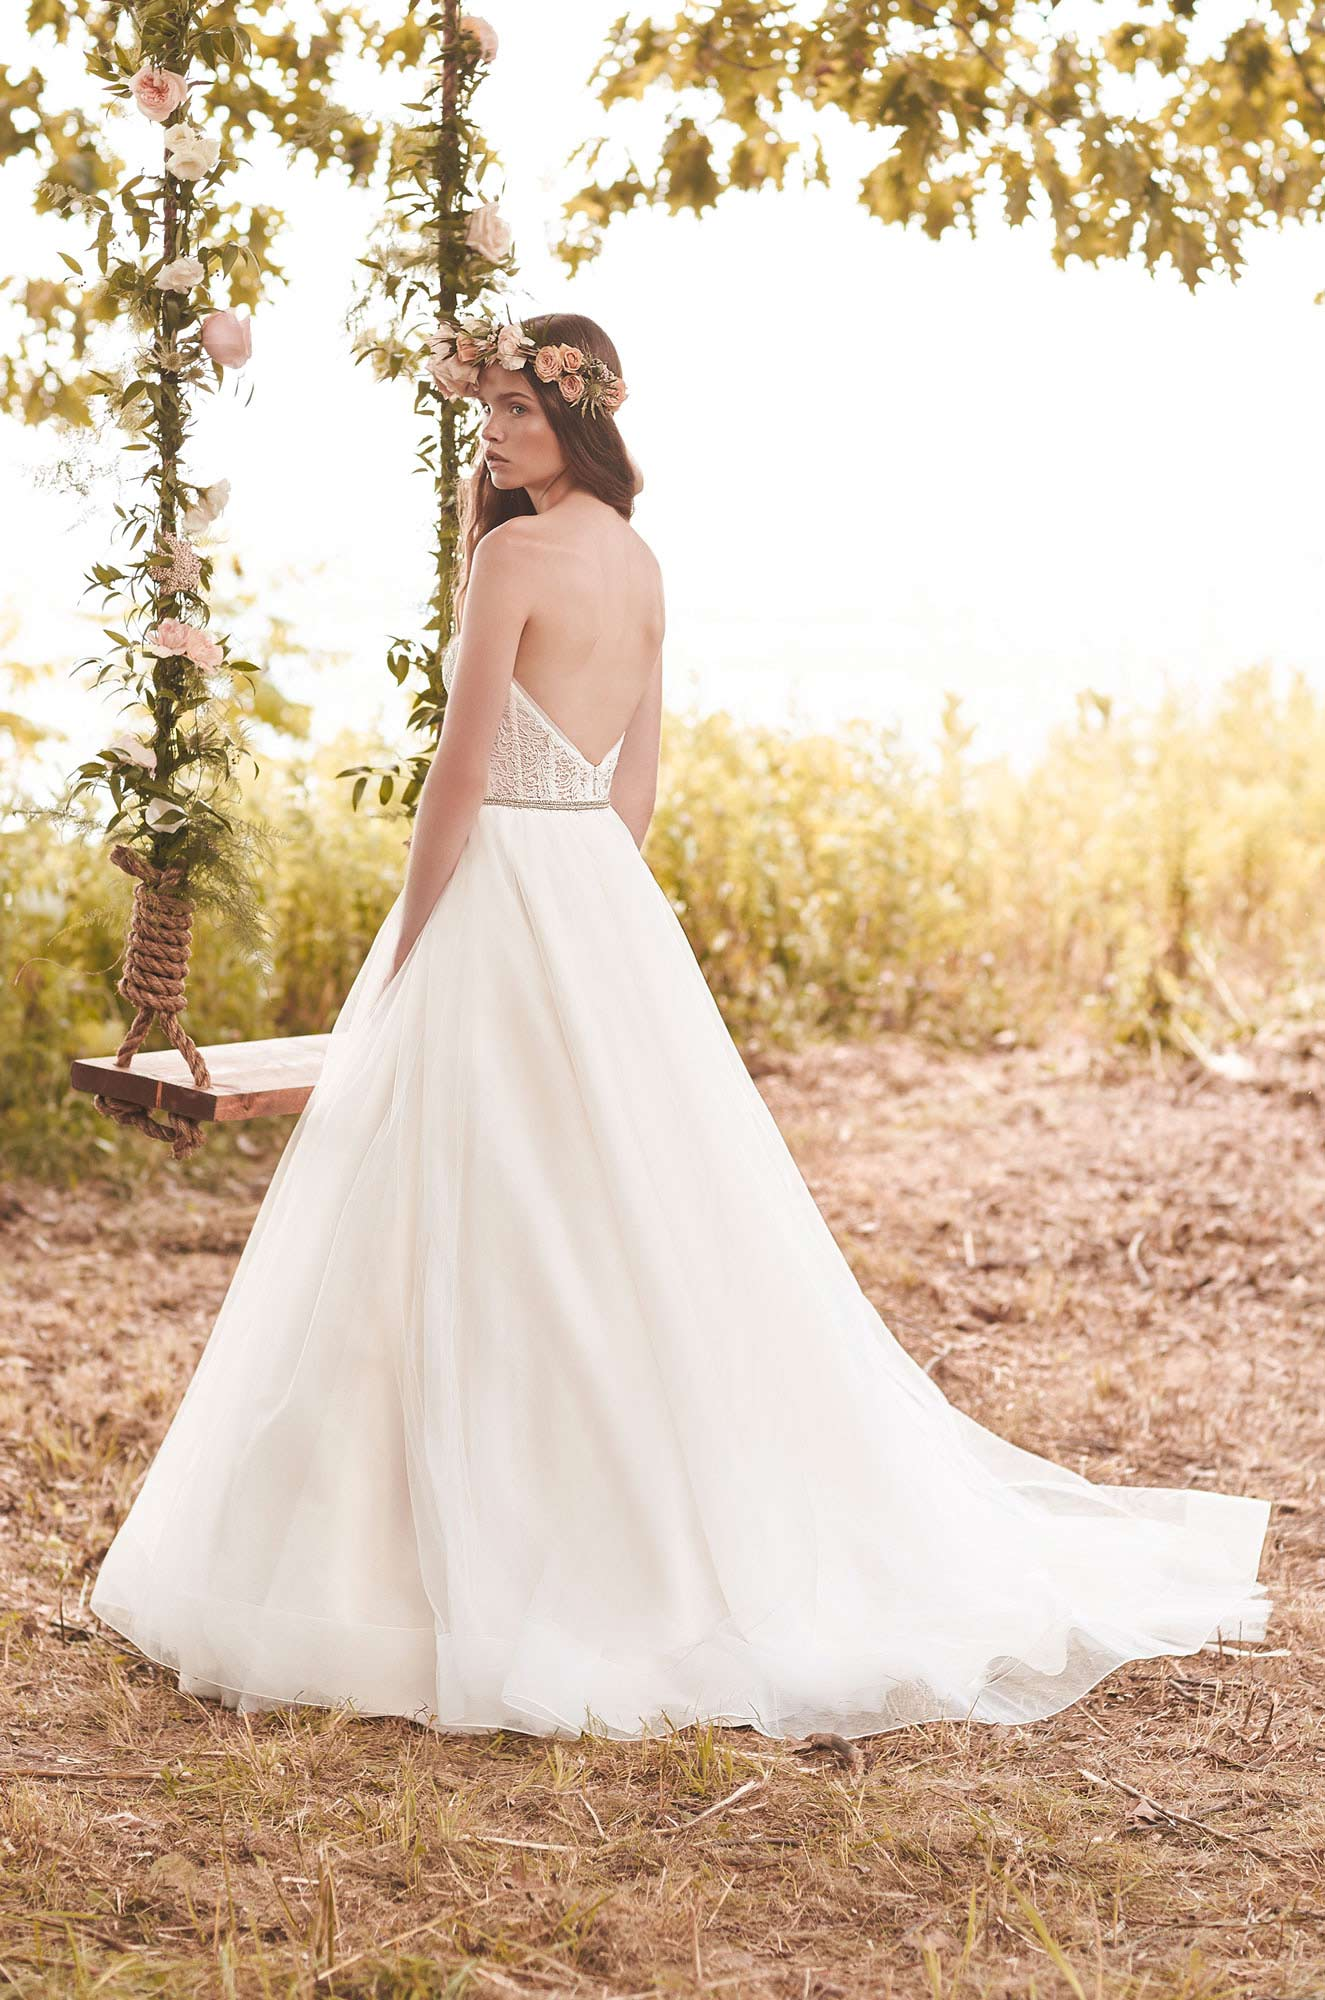 Corset Bodice Wedding Dress   Style  2065   Mikaella Bridal. Corset Bodice Wedding Dress. Home Design Ideas